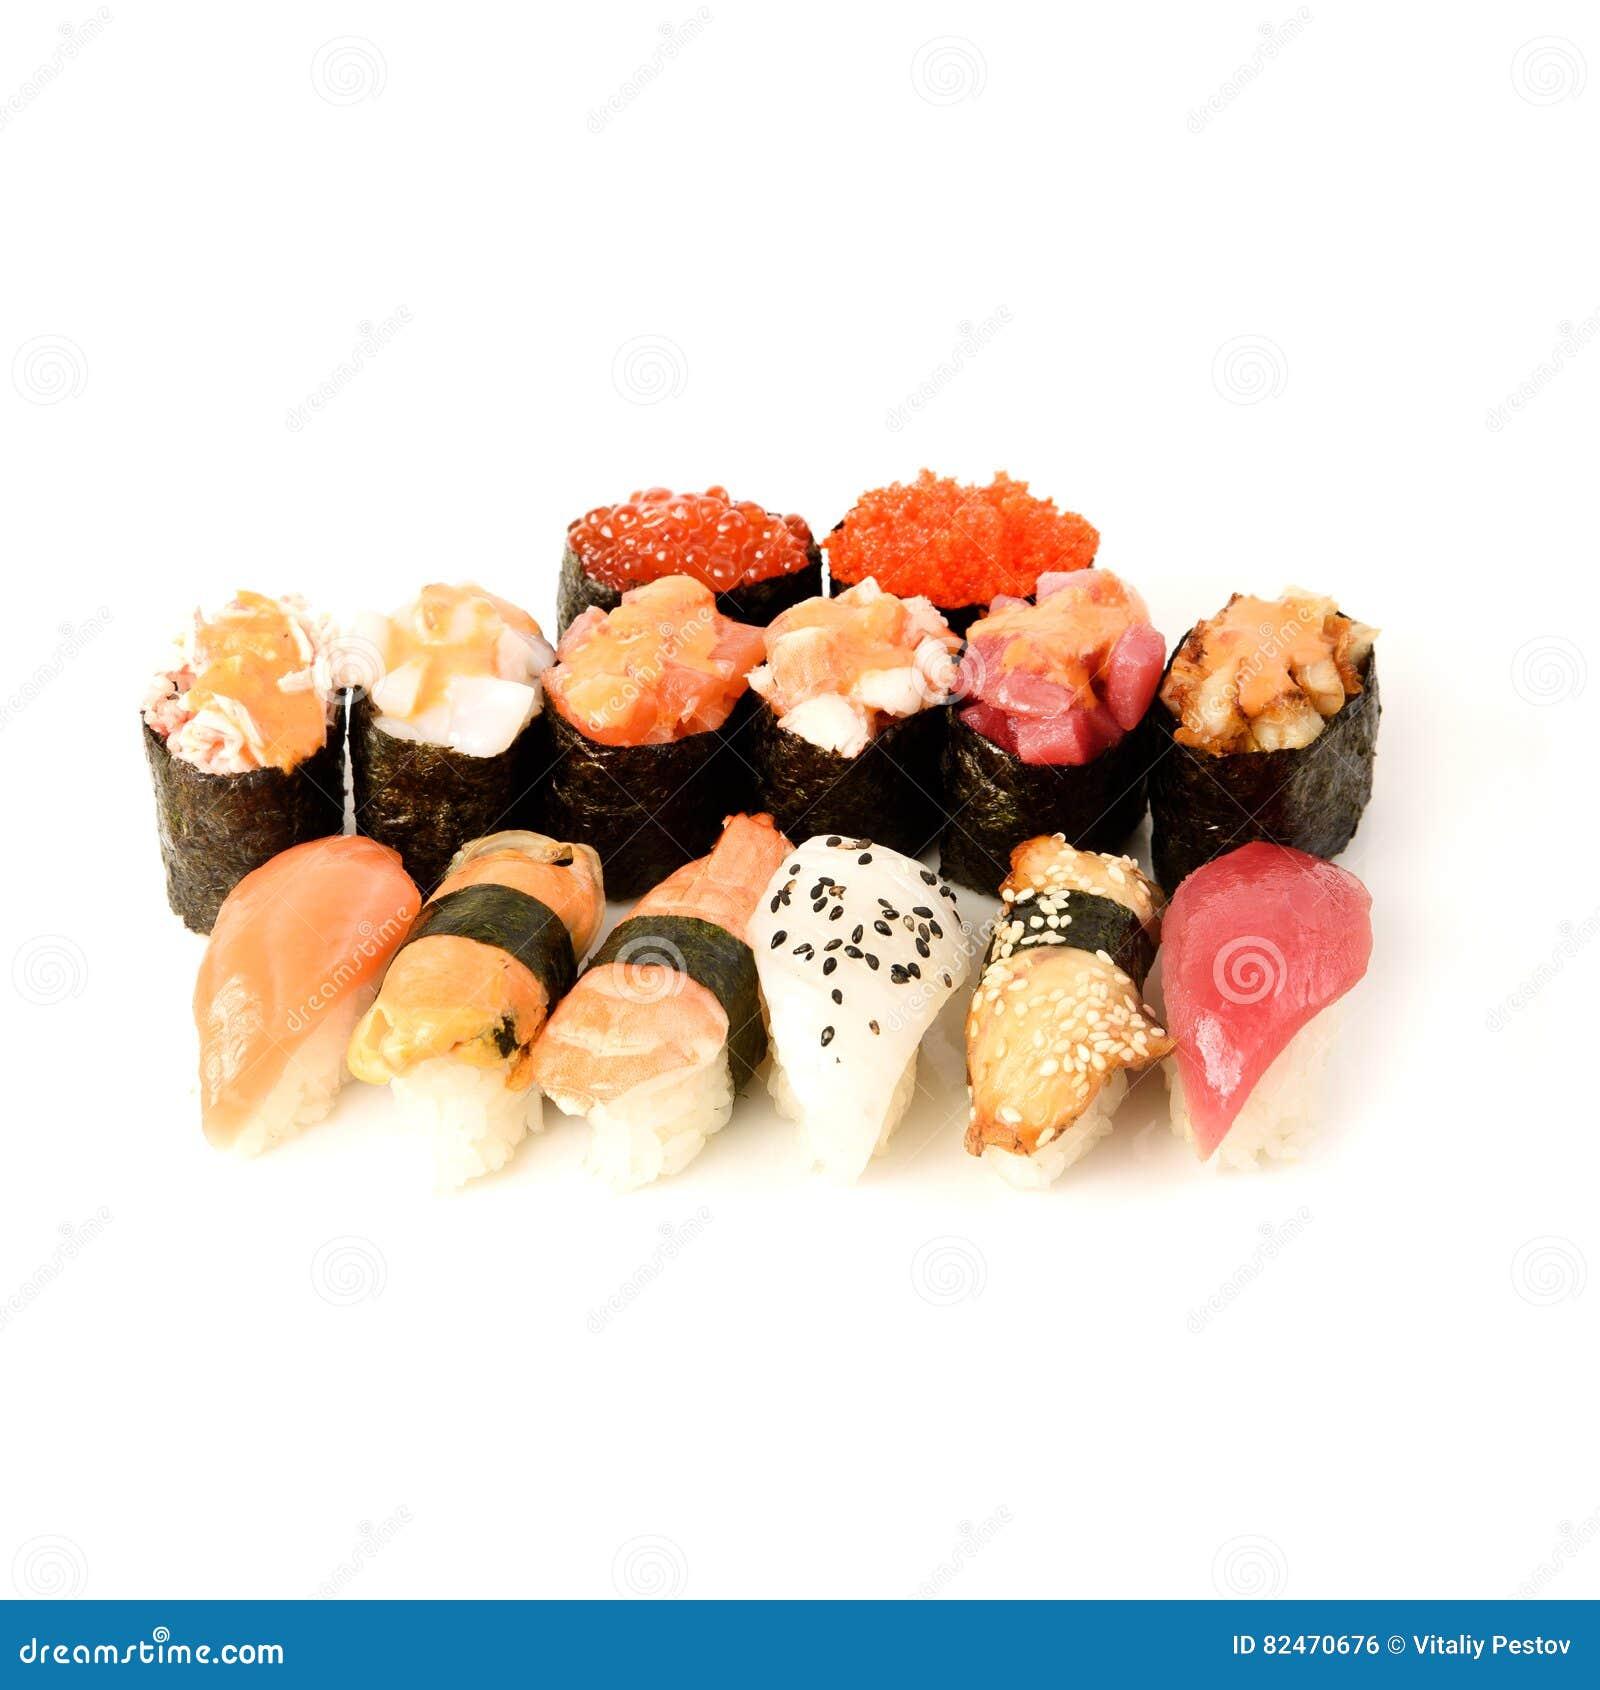 Japanese food restaurant delivery - sushi maki california gunkan roll platter big set isolated at white background